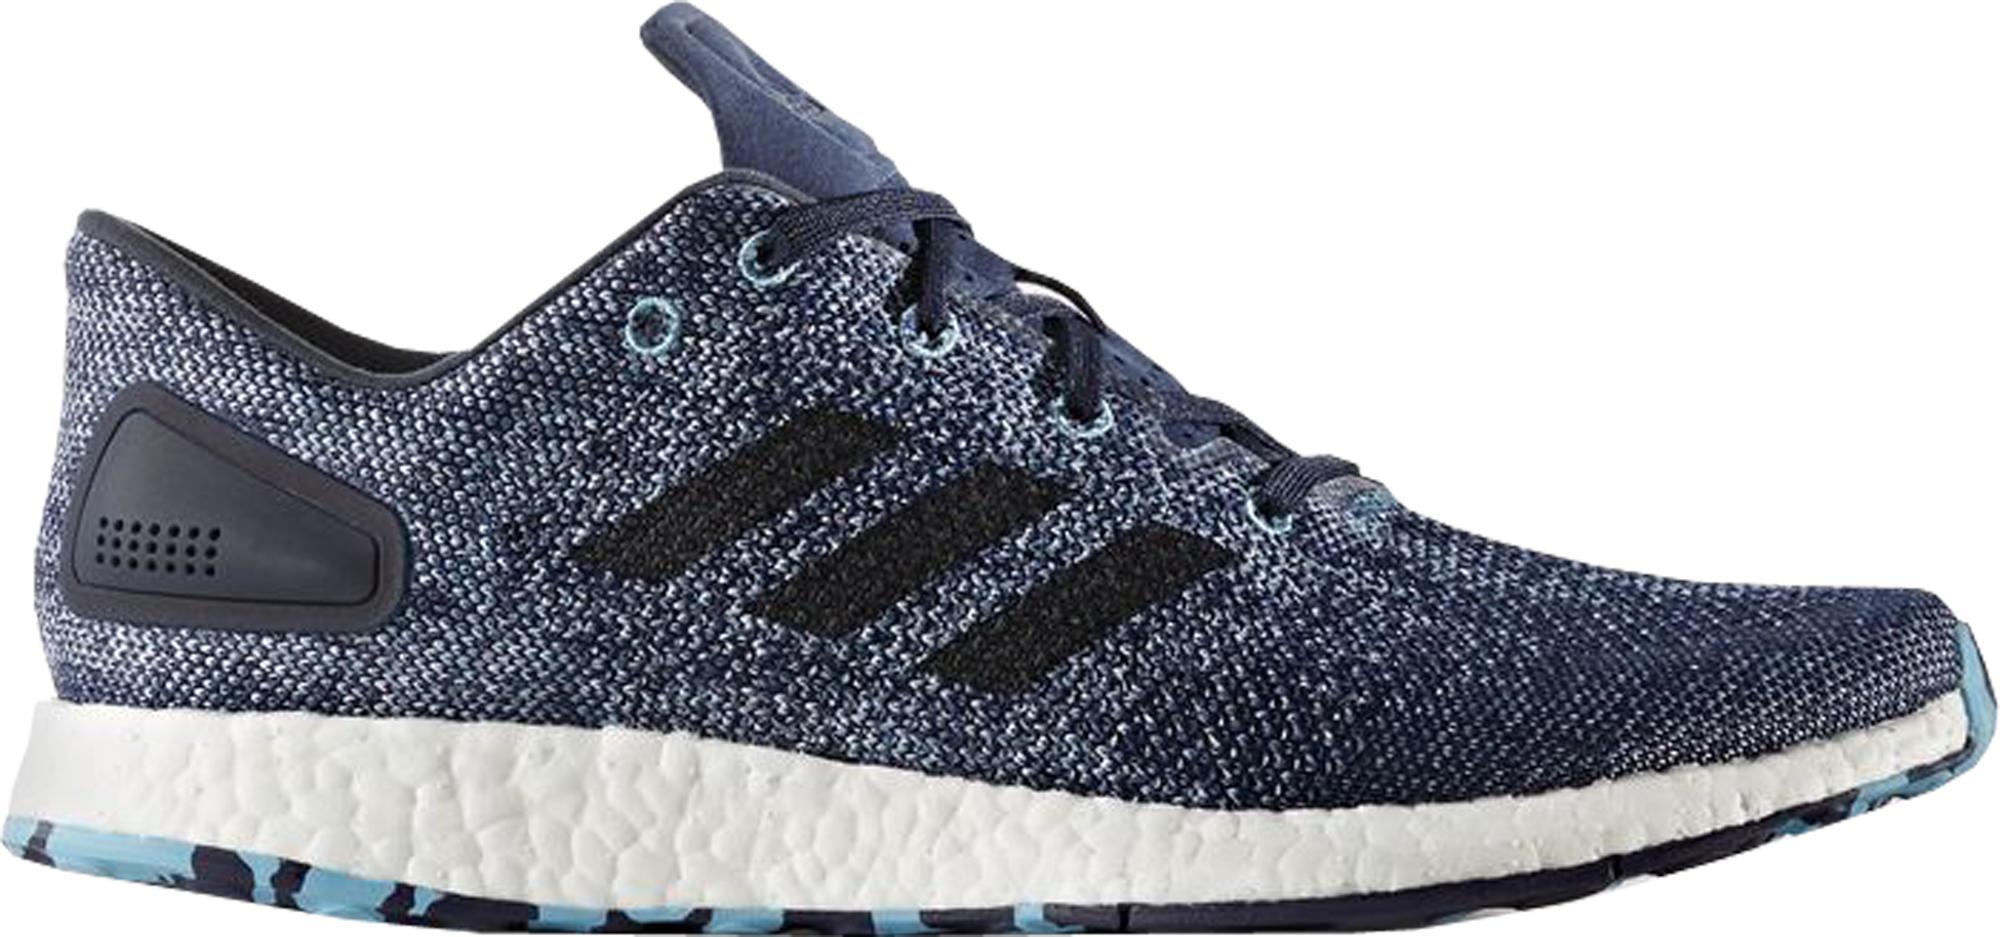 adidas PureBoost DPR Vapor Blue - CG2994